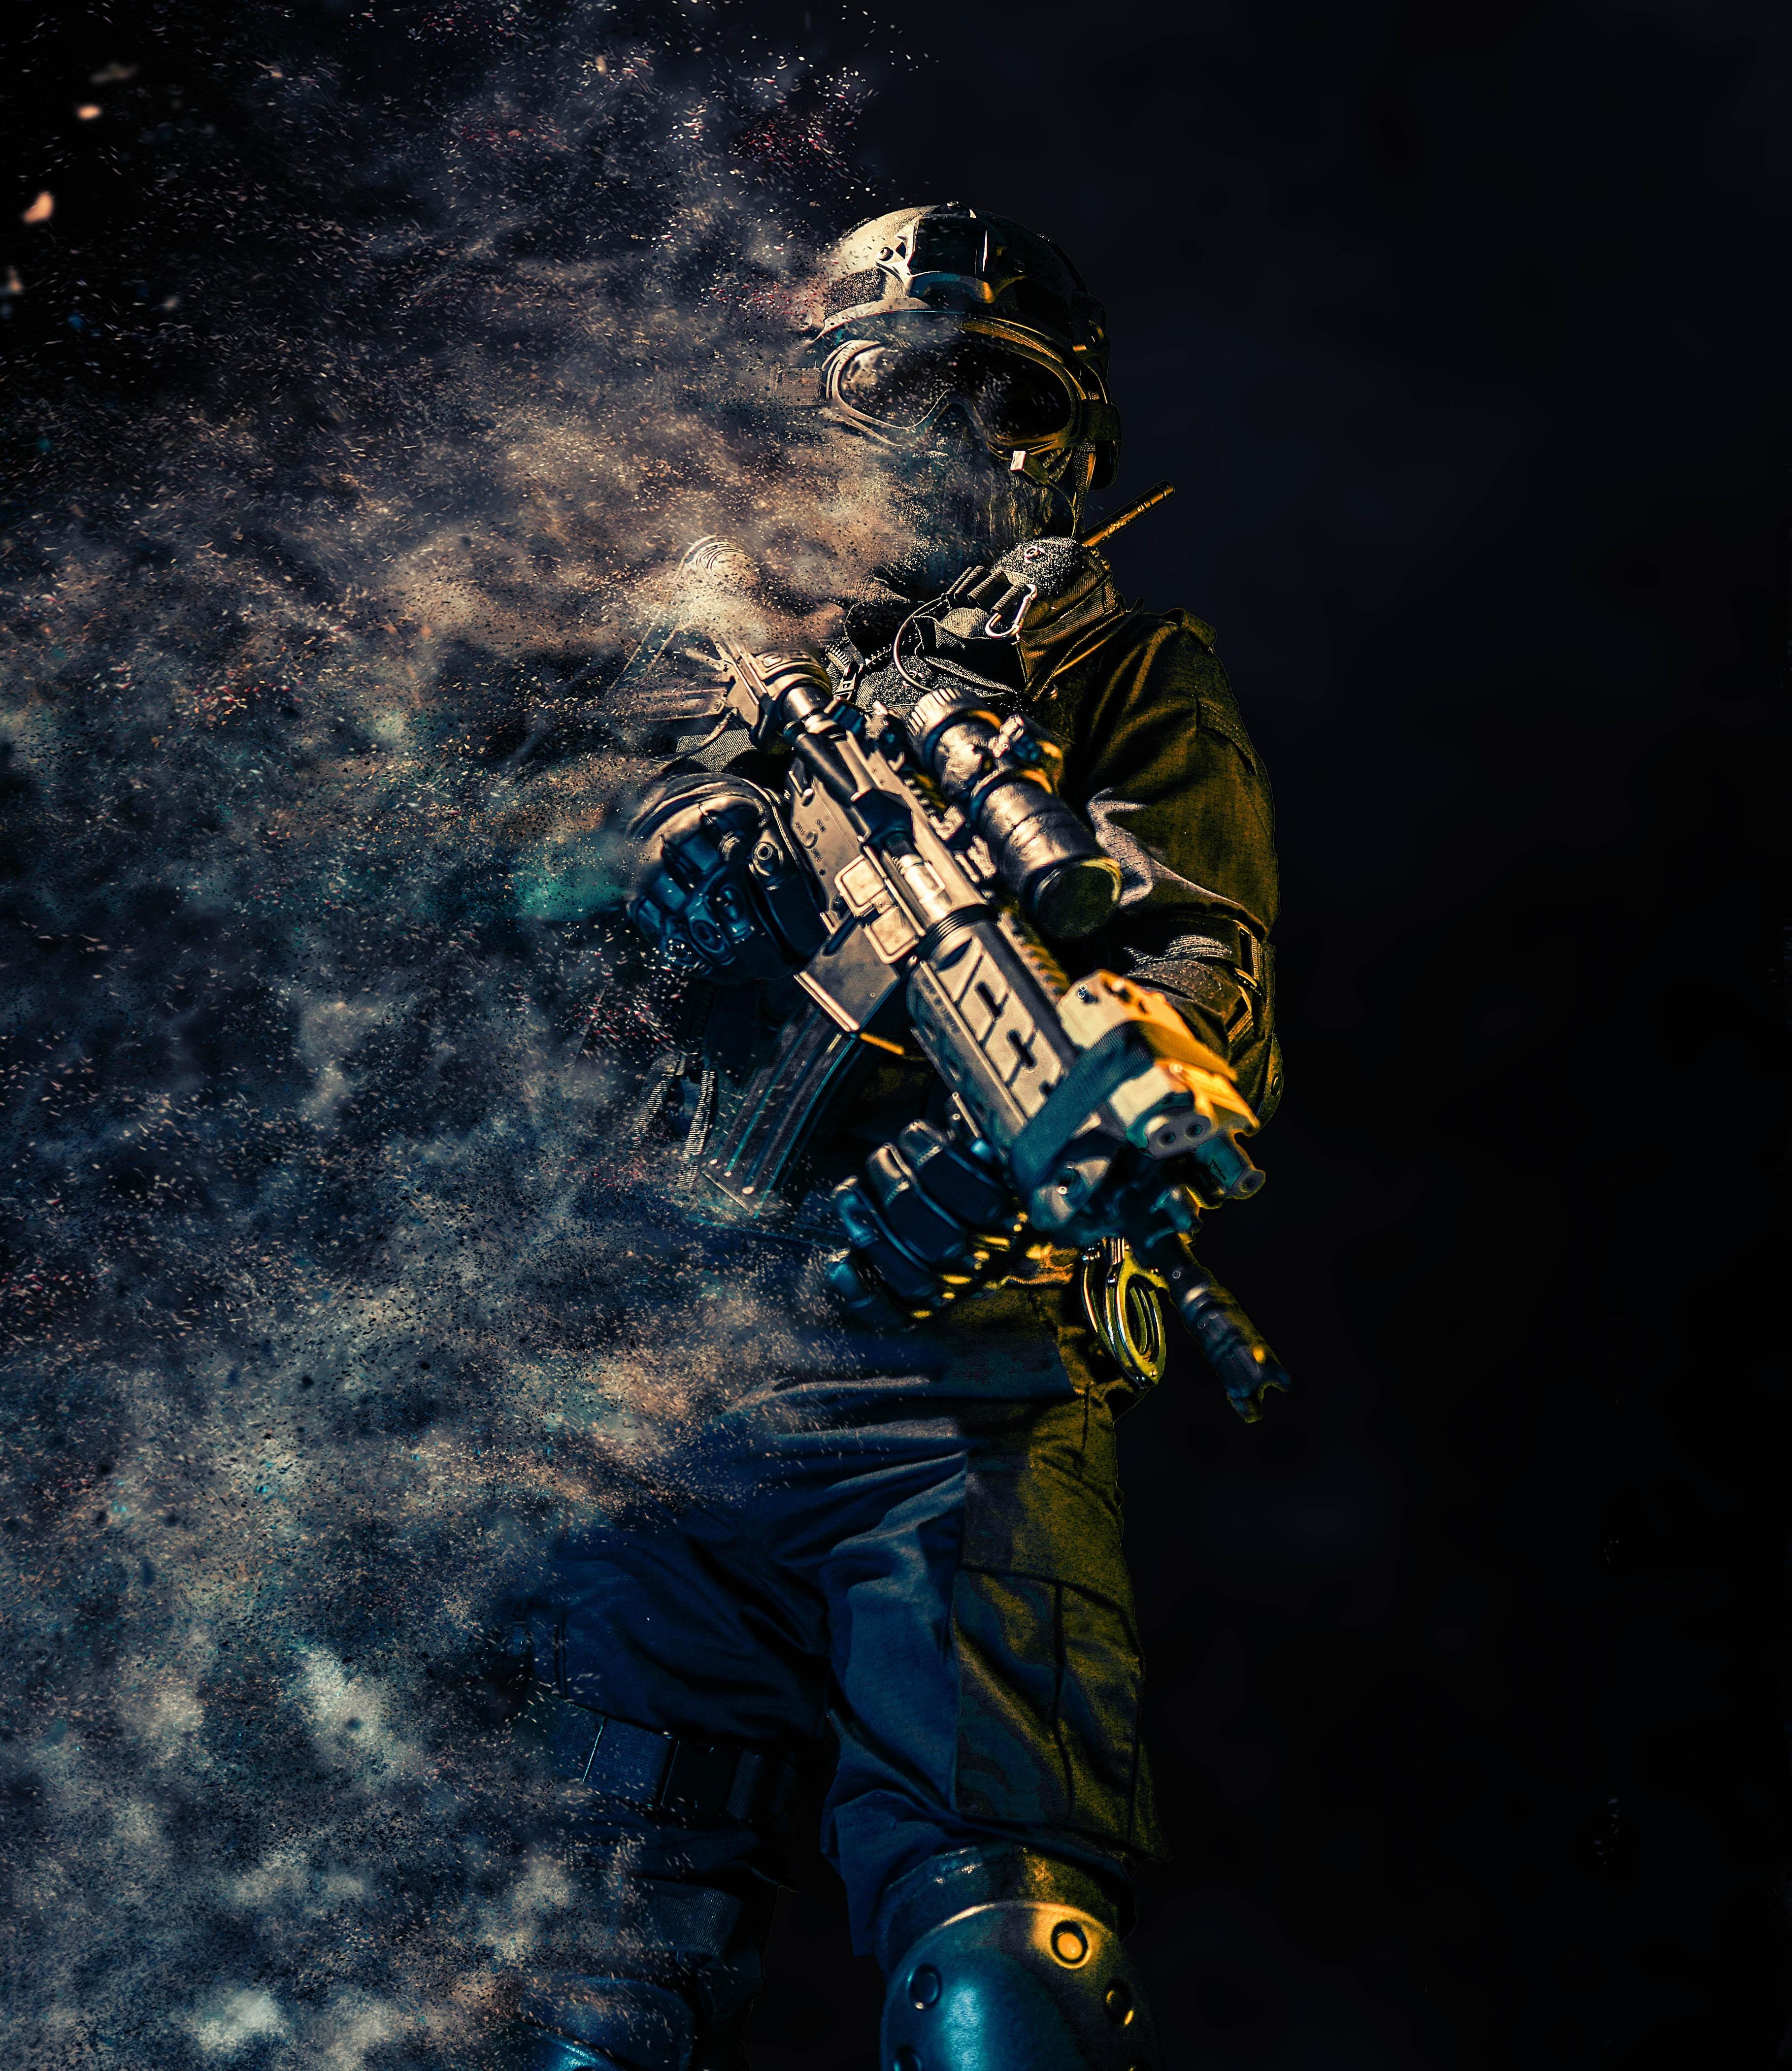 27+ Gun Pictures  Download Free Images on Unsplash